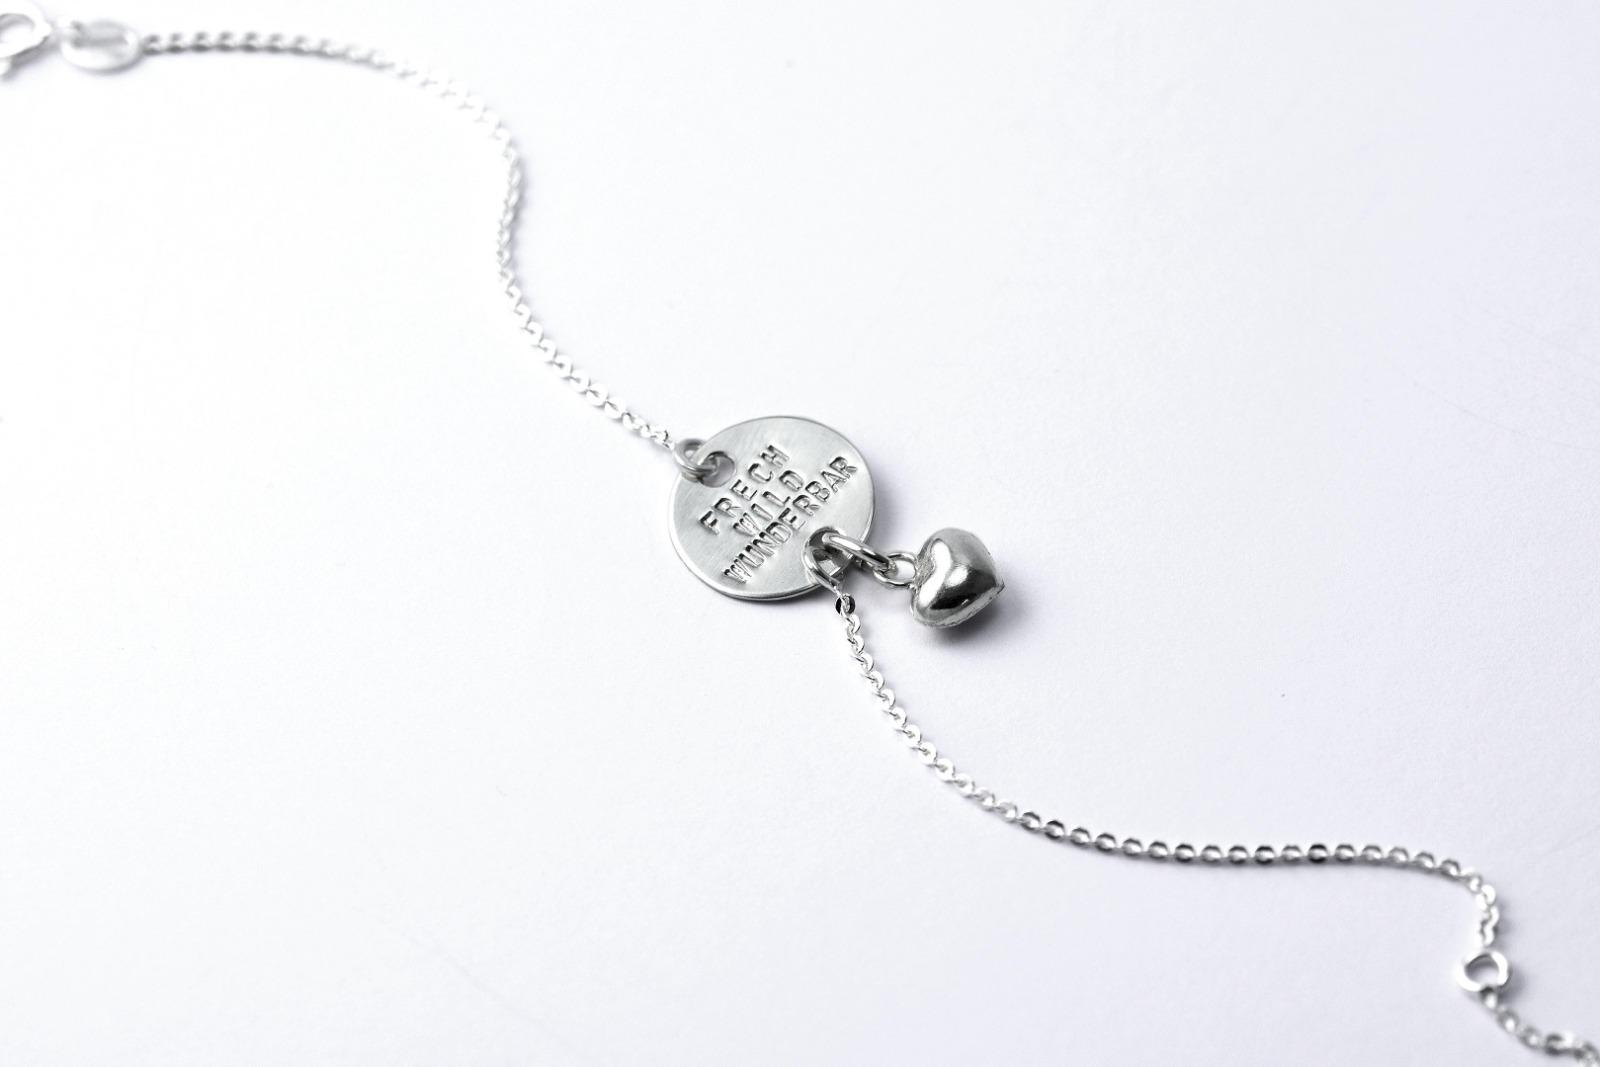 Zartes Silberarmband - Namens- Geburts- Spruchband